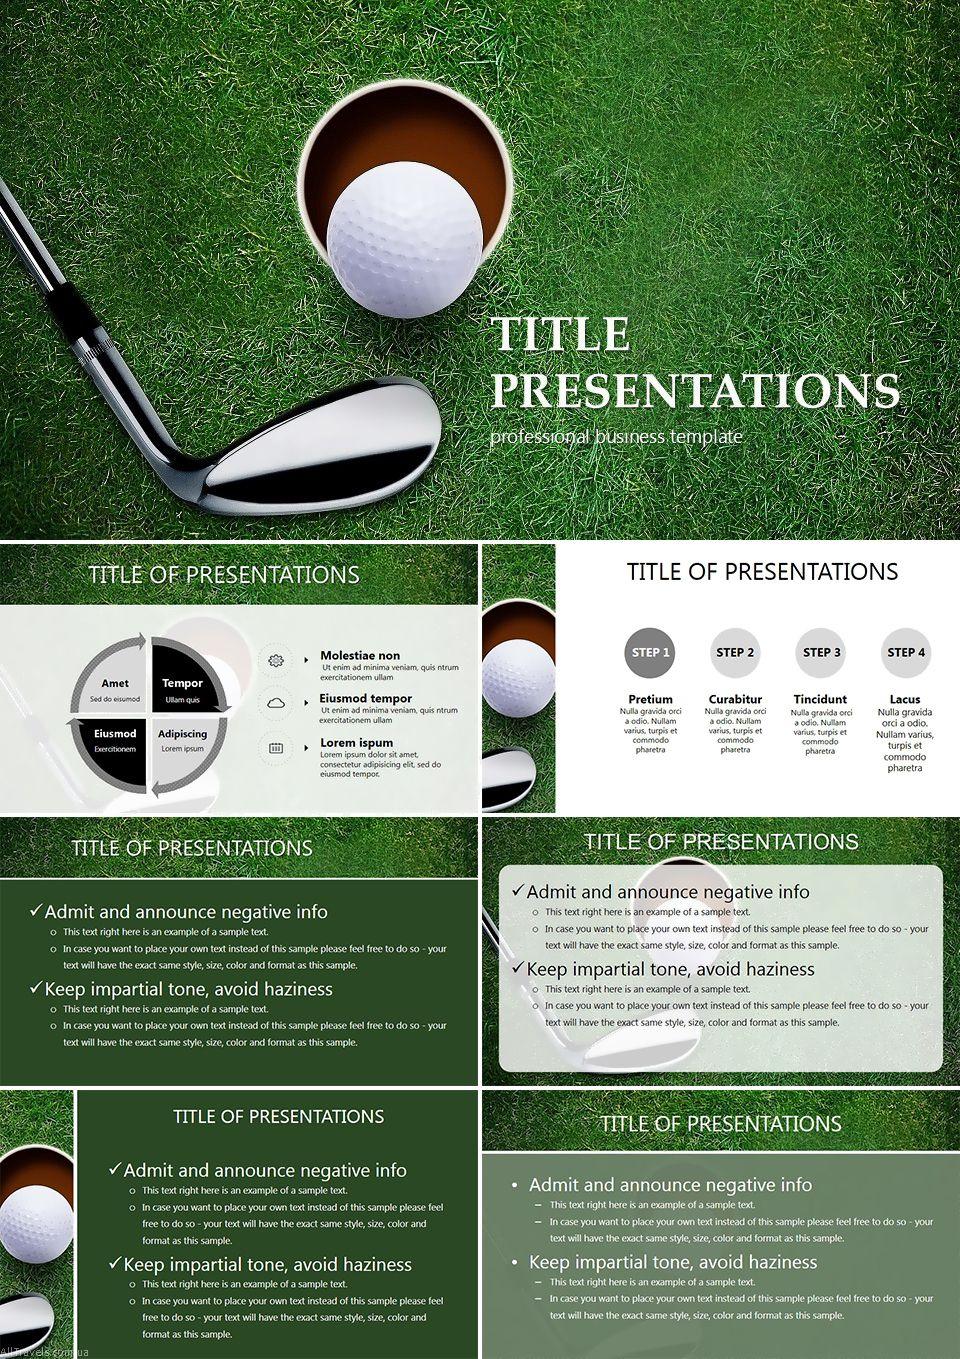 Rules of the games golf powerpoint templates template rules of the games golf powerpoint templates toneelgroepblik Gallery